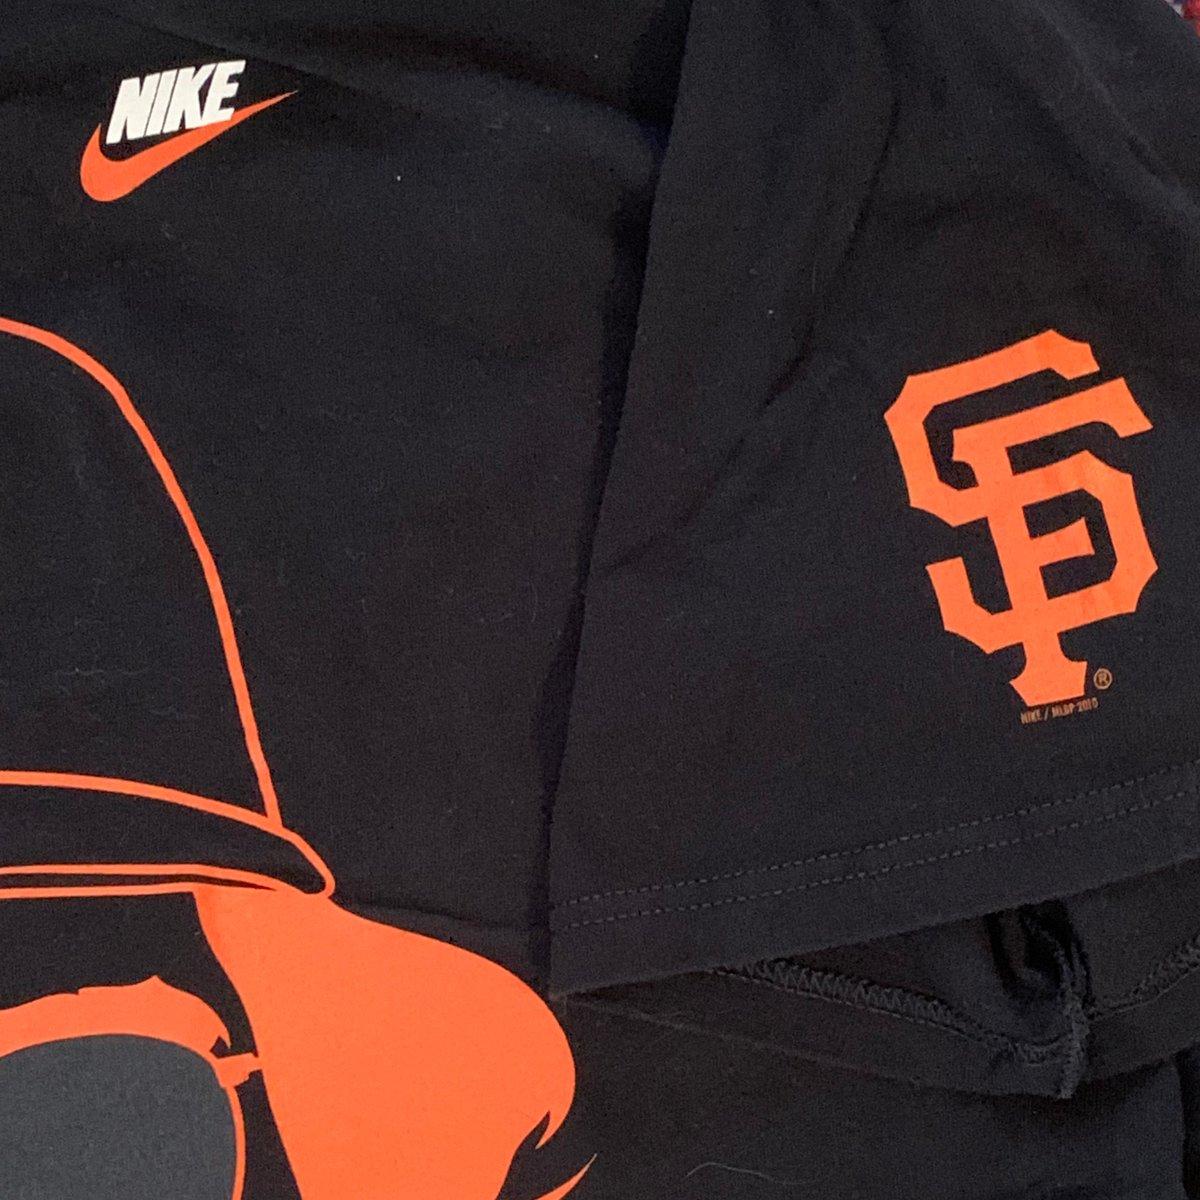 Original Rare Jerry Garcia Nike SF Giants 2010 Tee! XL